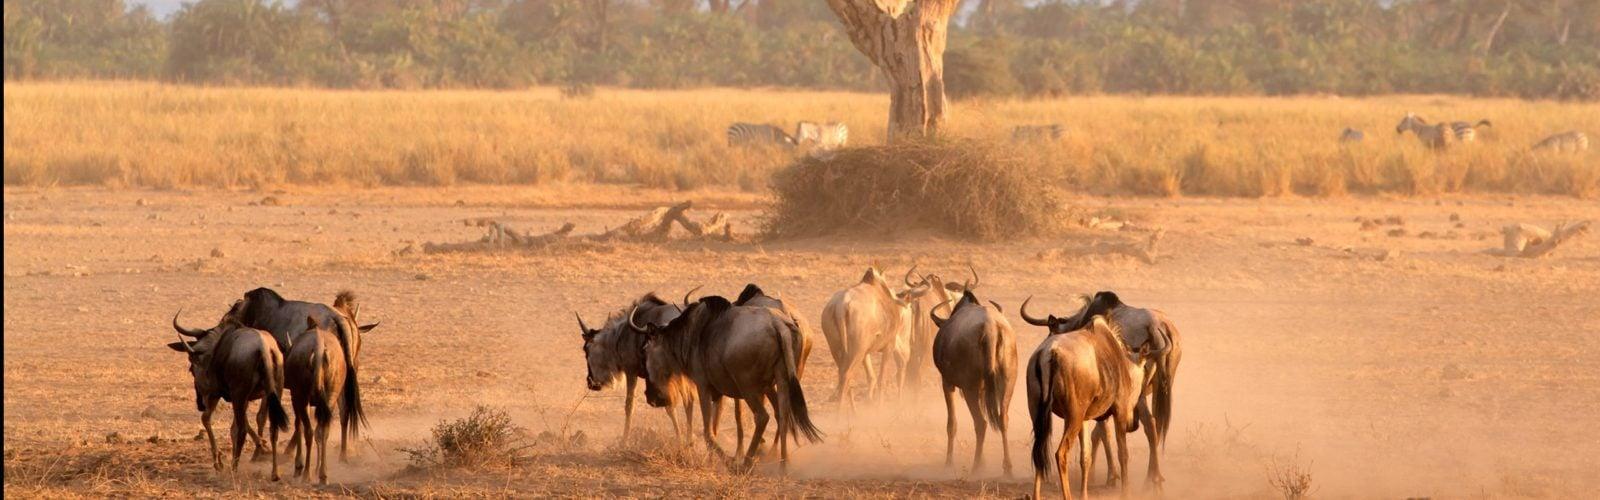 amboseli-wildebeest